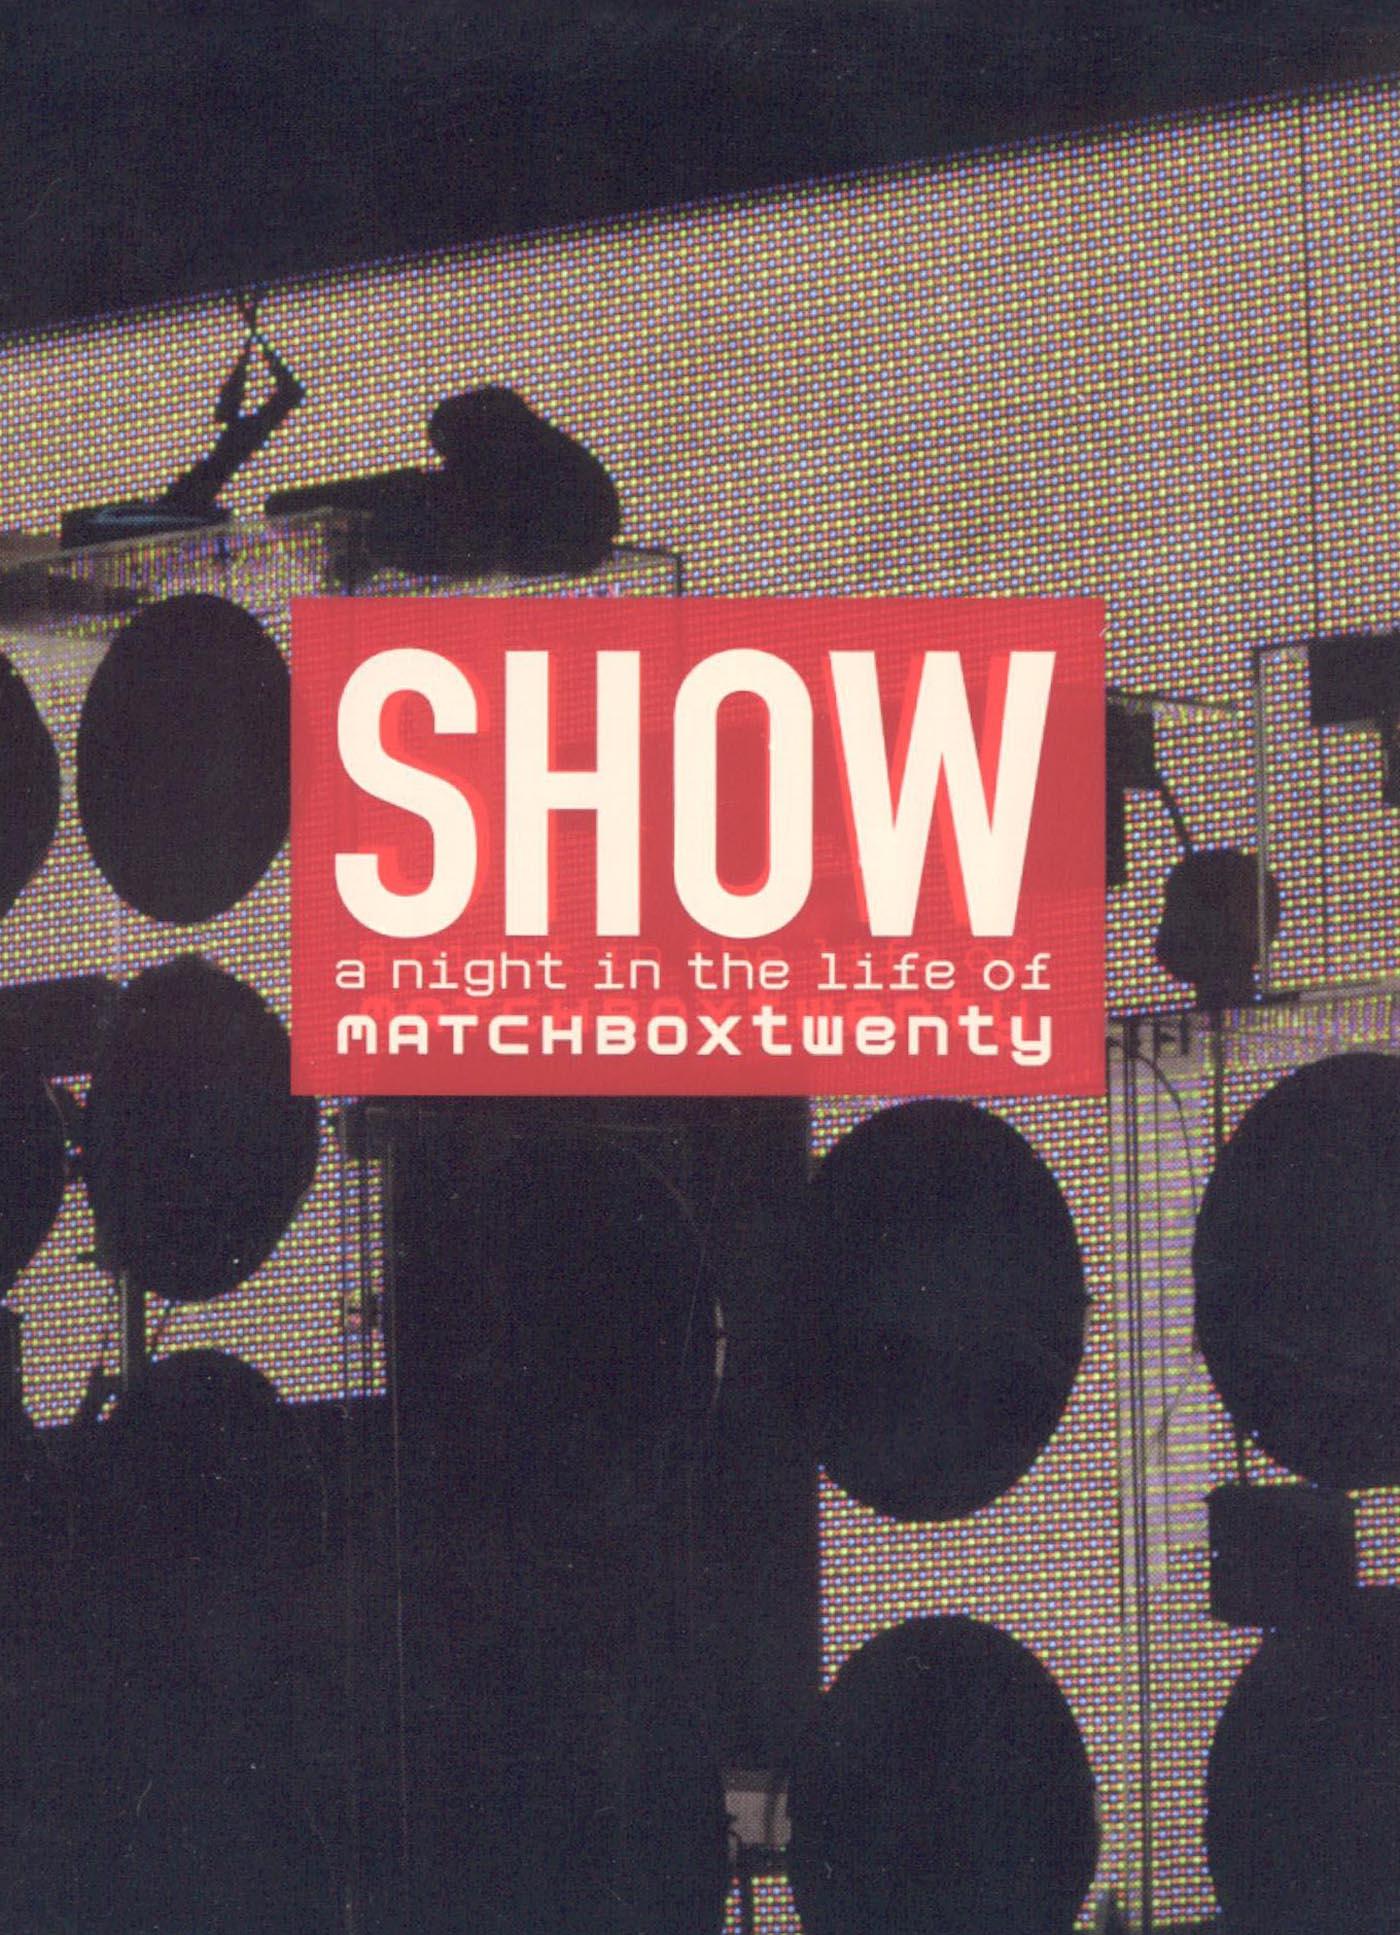 Matchbox Twenty: Show - A Night in the Life of Matchbox Twenty